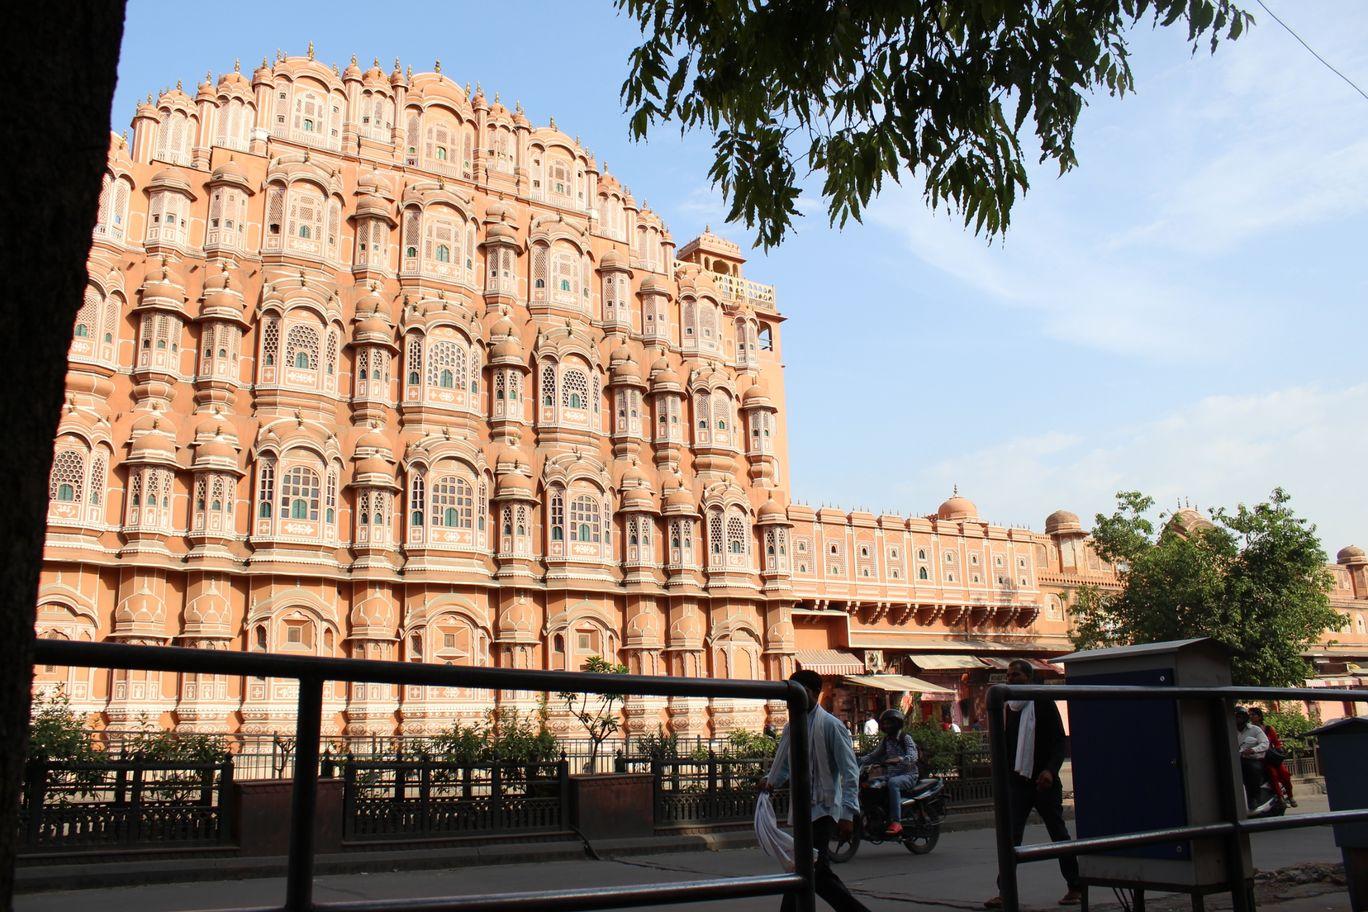 Photo of Jaipur By DEEPAK RATHORE☮️